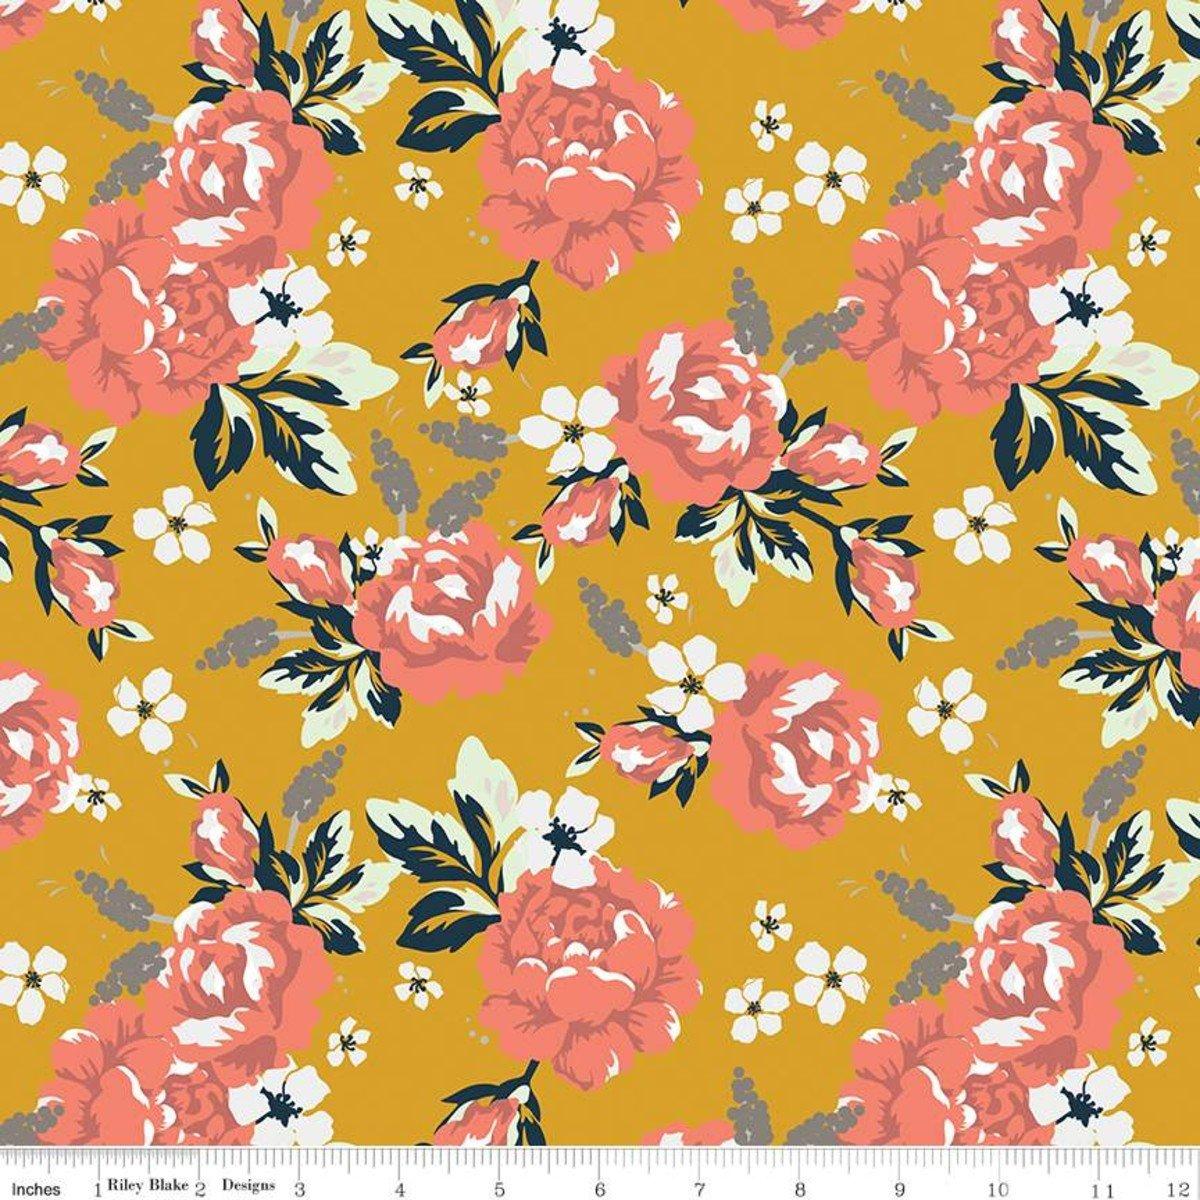 Riley Blake - Fancy Pants Designs - Amber Labou - Golden Days - Floral - Mustard